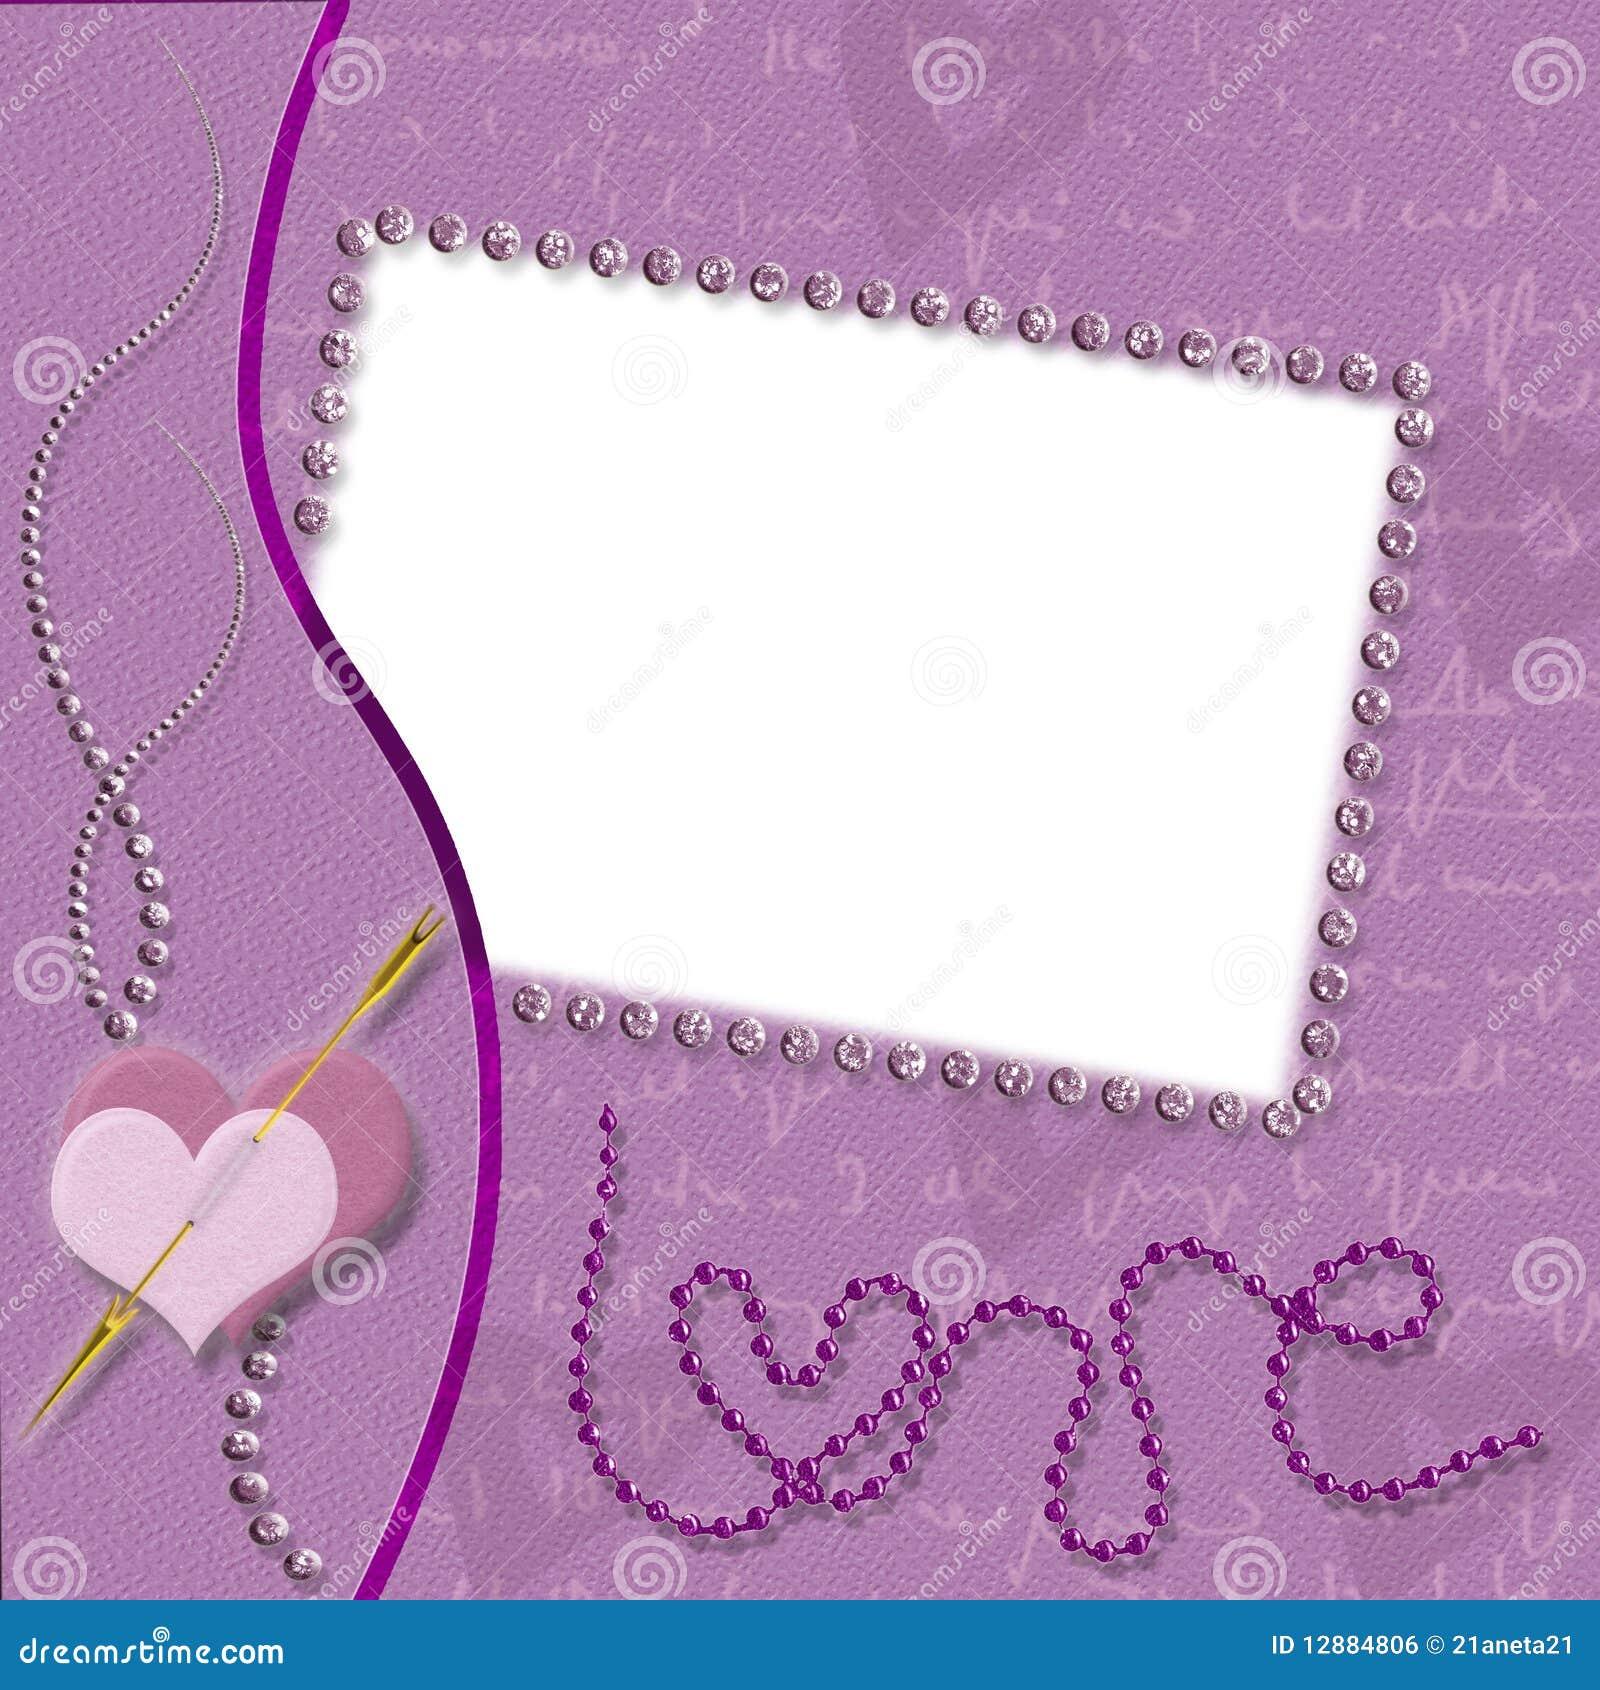 Royalty Free Stock Image: Violet frame love